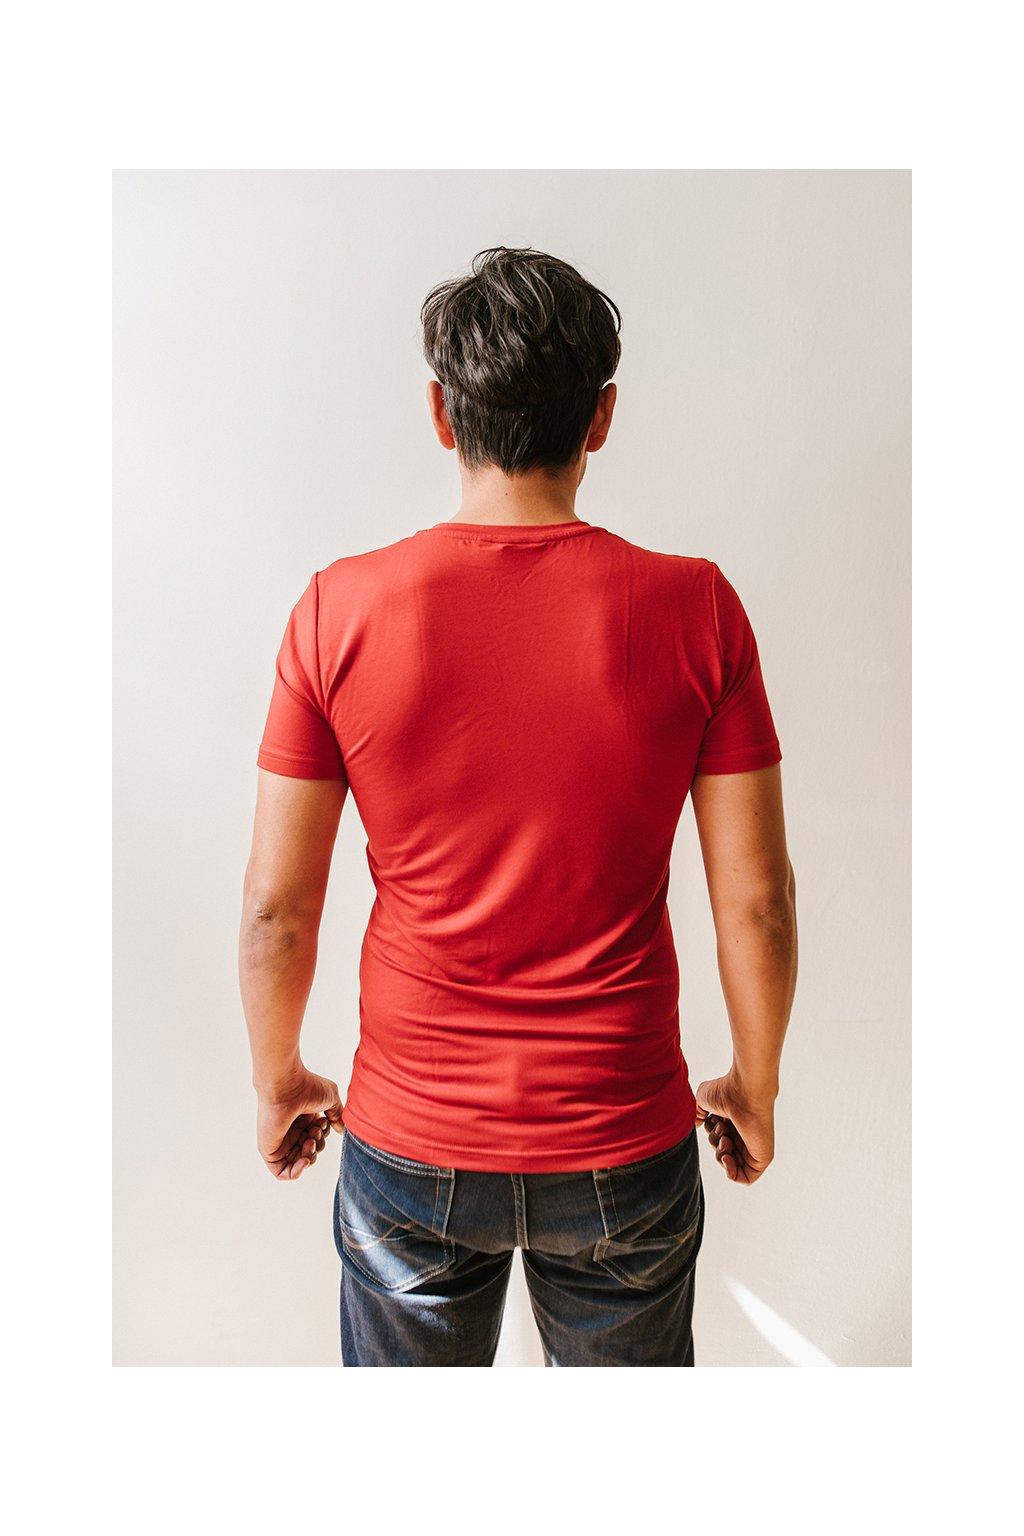 Bambusové tričko Adam červené s krátkým rukávem